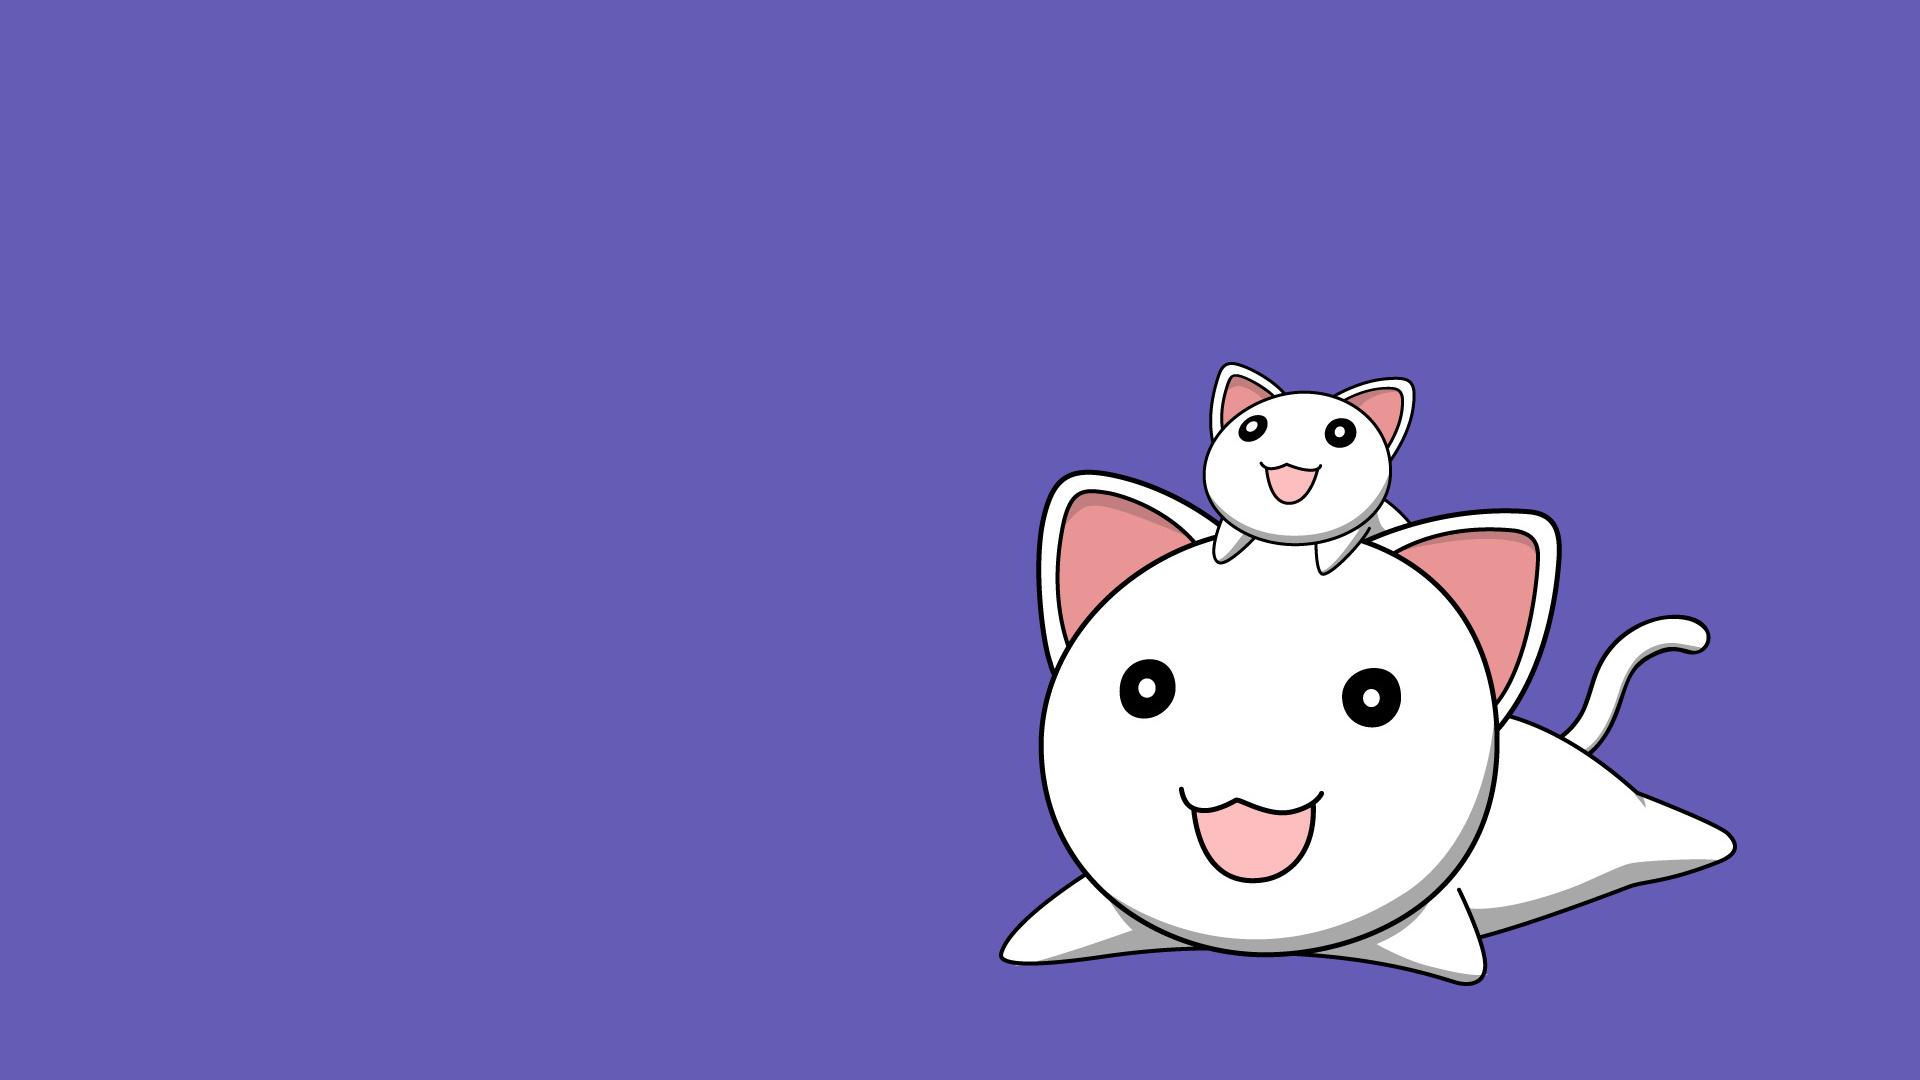 Furry Cat Girl Phone Wallpaper Anime Cat Desktop Wallpaper Pixelstalk Net